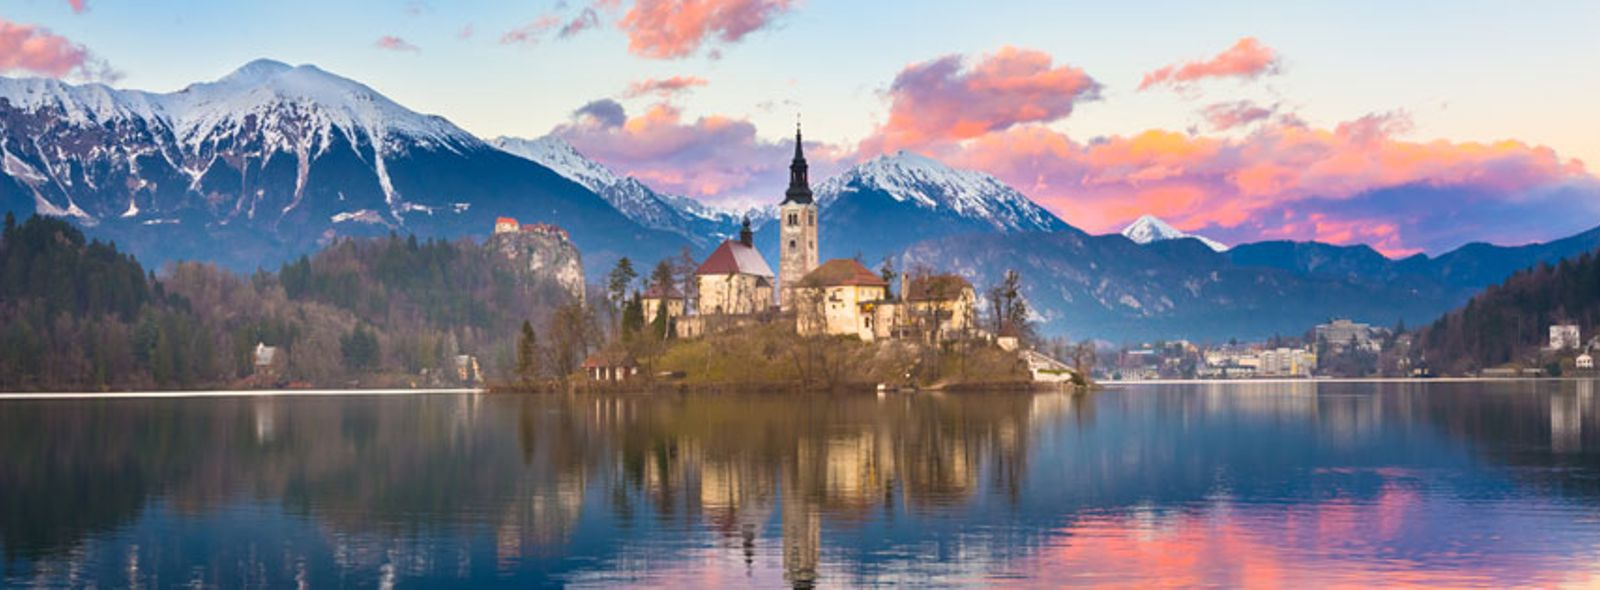 Weekend in Slovenia